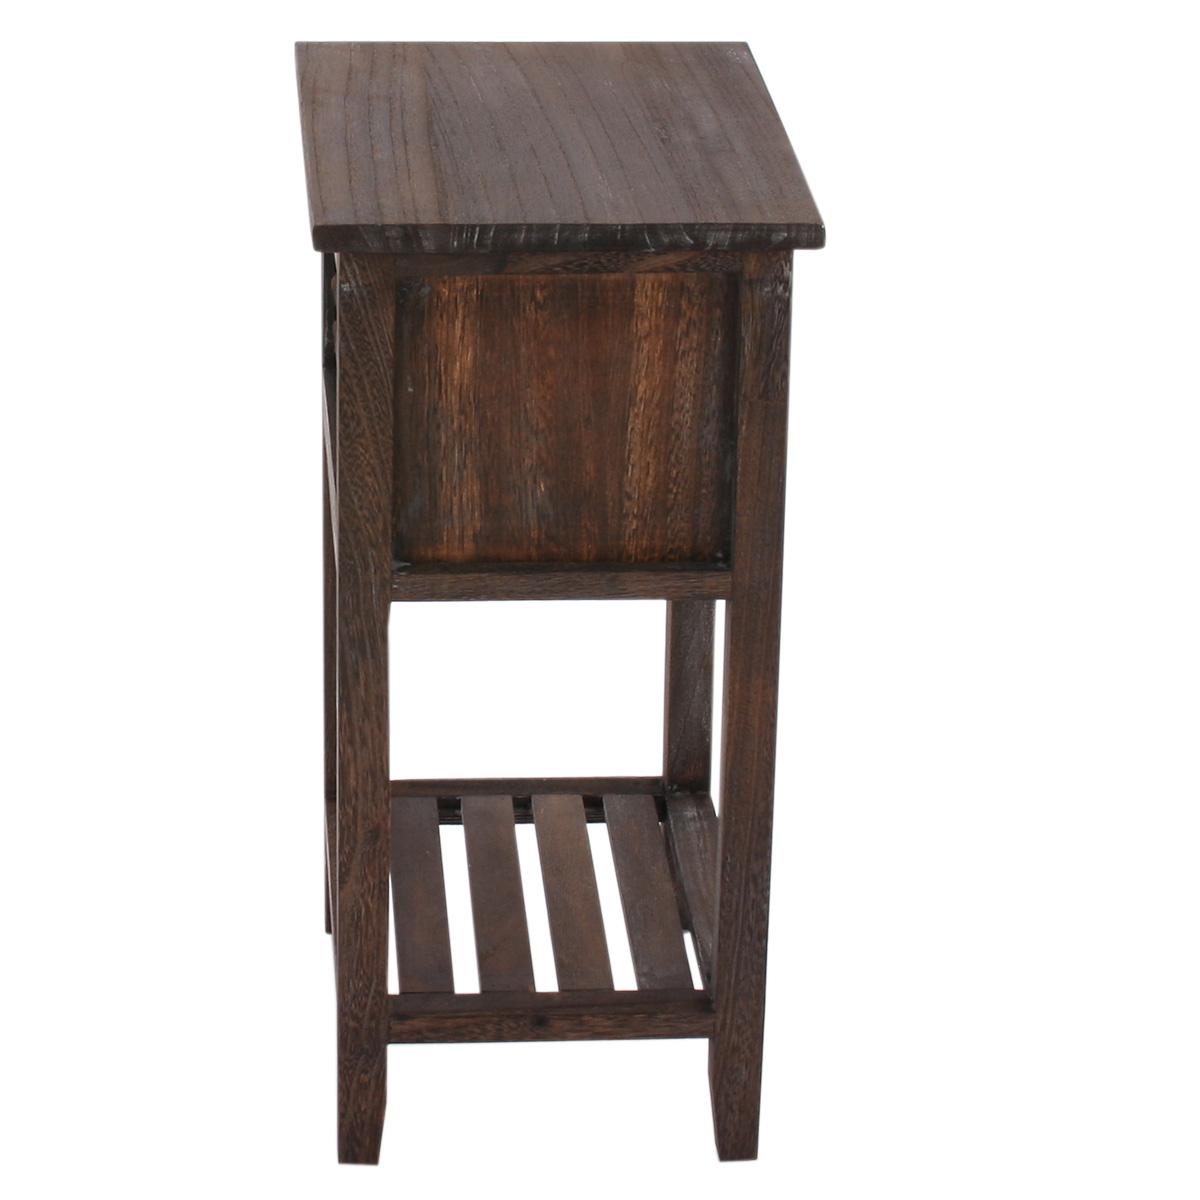 kommode beistelltisch 57x35x27cm shabby look shabby chic. Black Bedroom Furniture Sets. Home Design Ideas